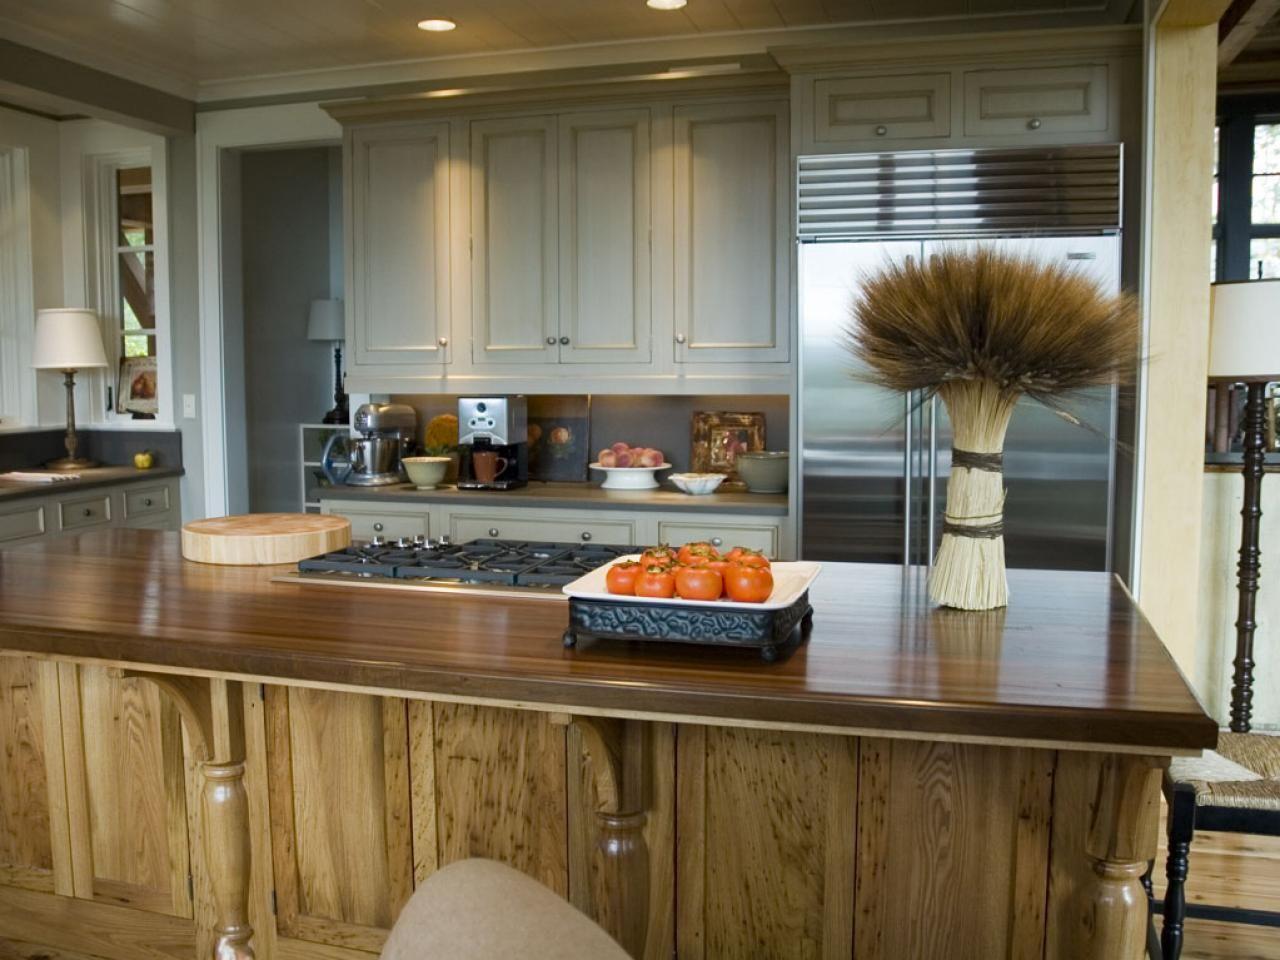 Dream Home Kitchen Designs Dream House Kitchen Design My Dream Home ...